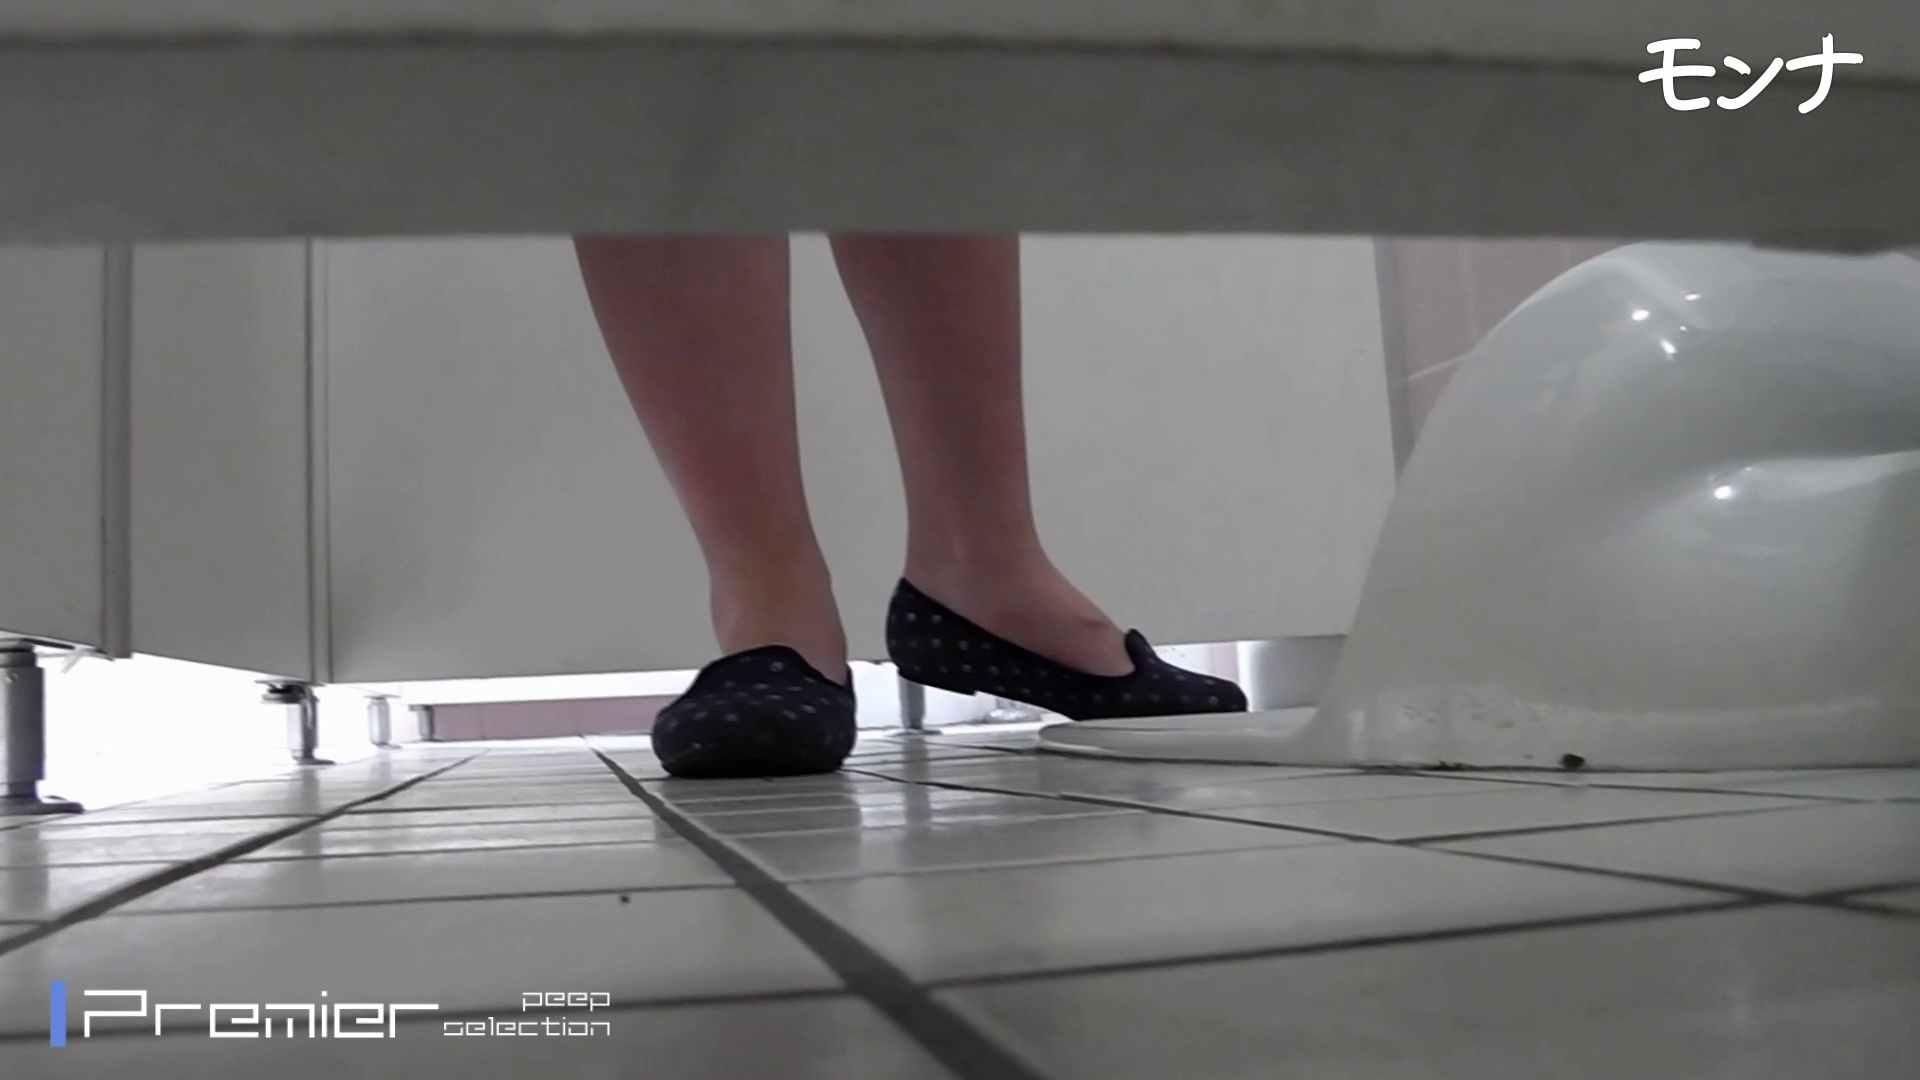 CM 悶絶シリーズ5 【美しい日本の未来 No.128】 細身体型 AV動画キャプチャ 111枚 36